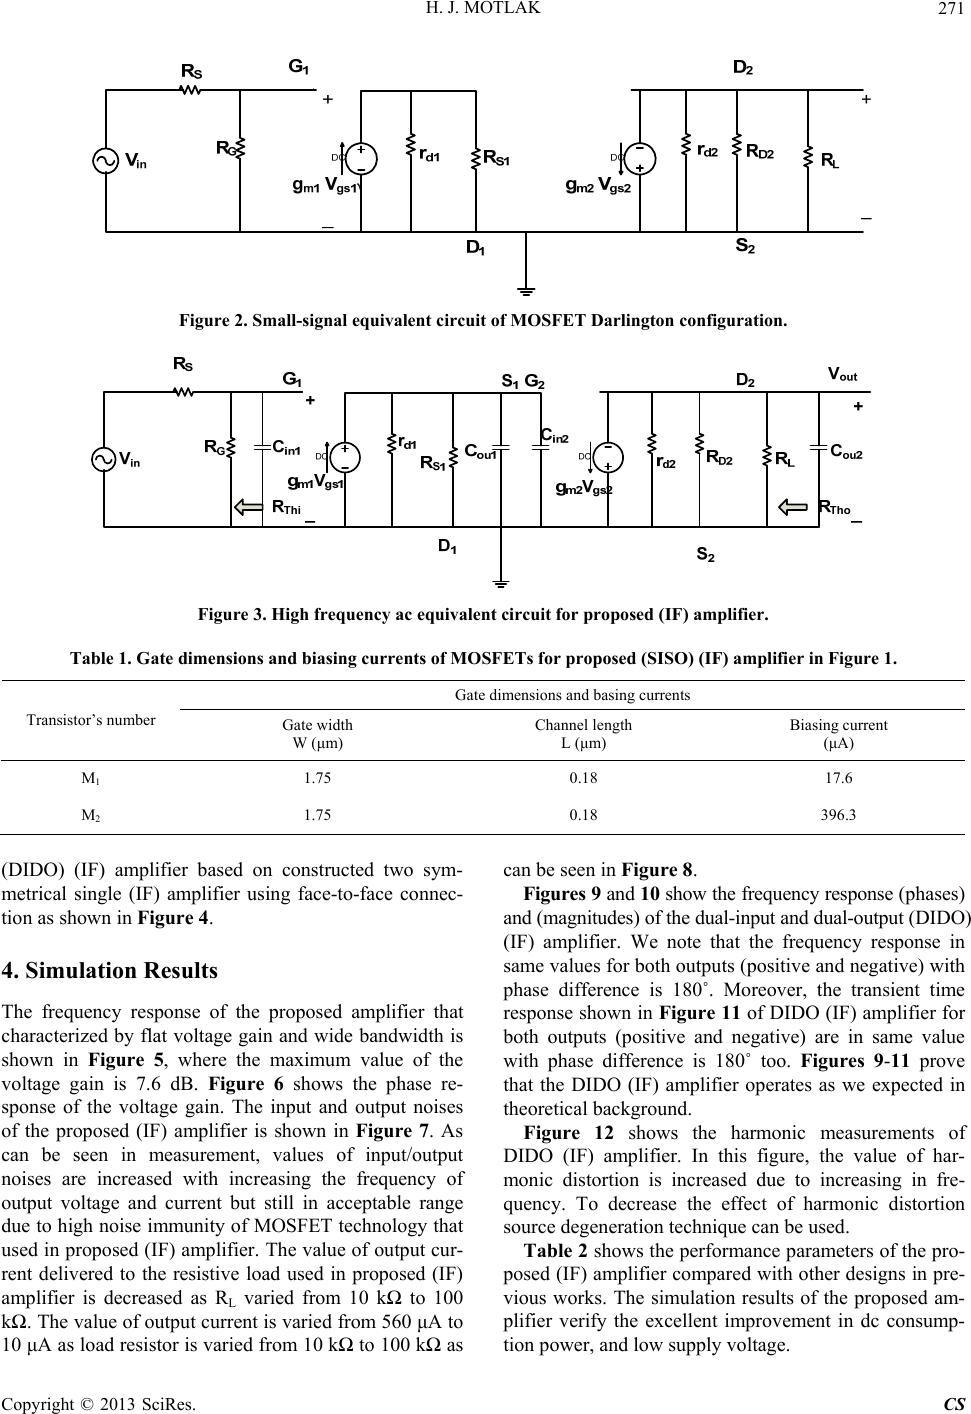 Design Of Low Voltage Power If Amplifier Based On Mosfet Thedarlingtonpaircircuitjpg H J Motlak